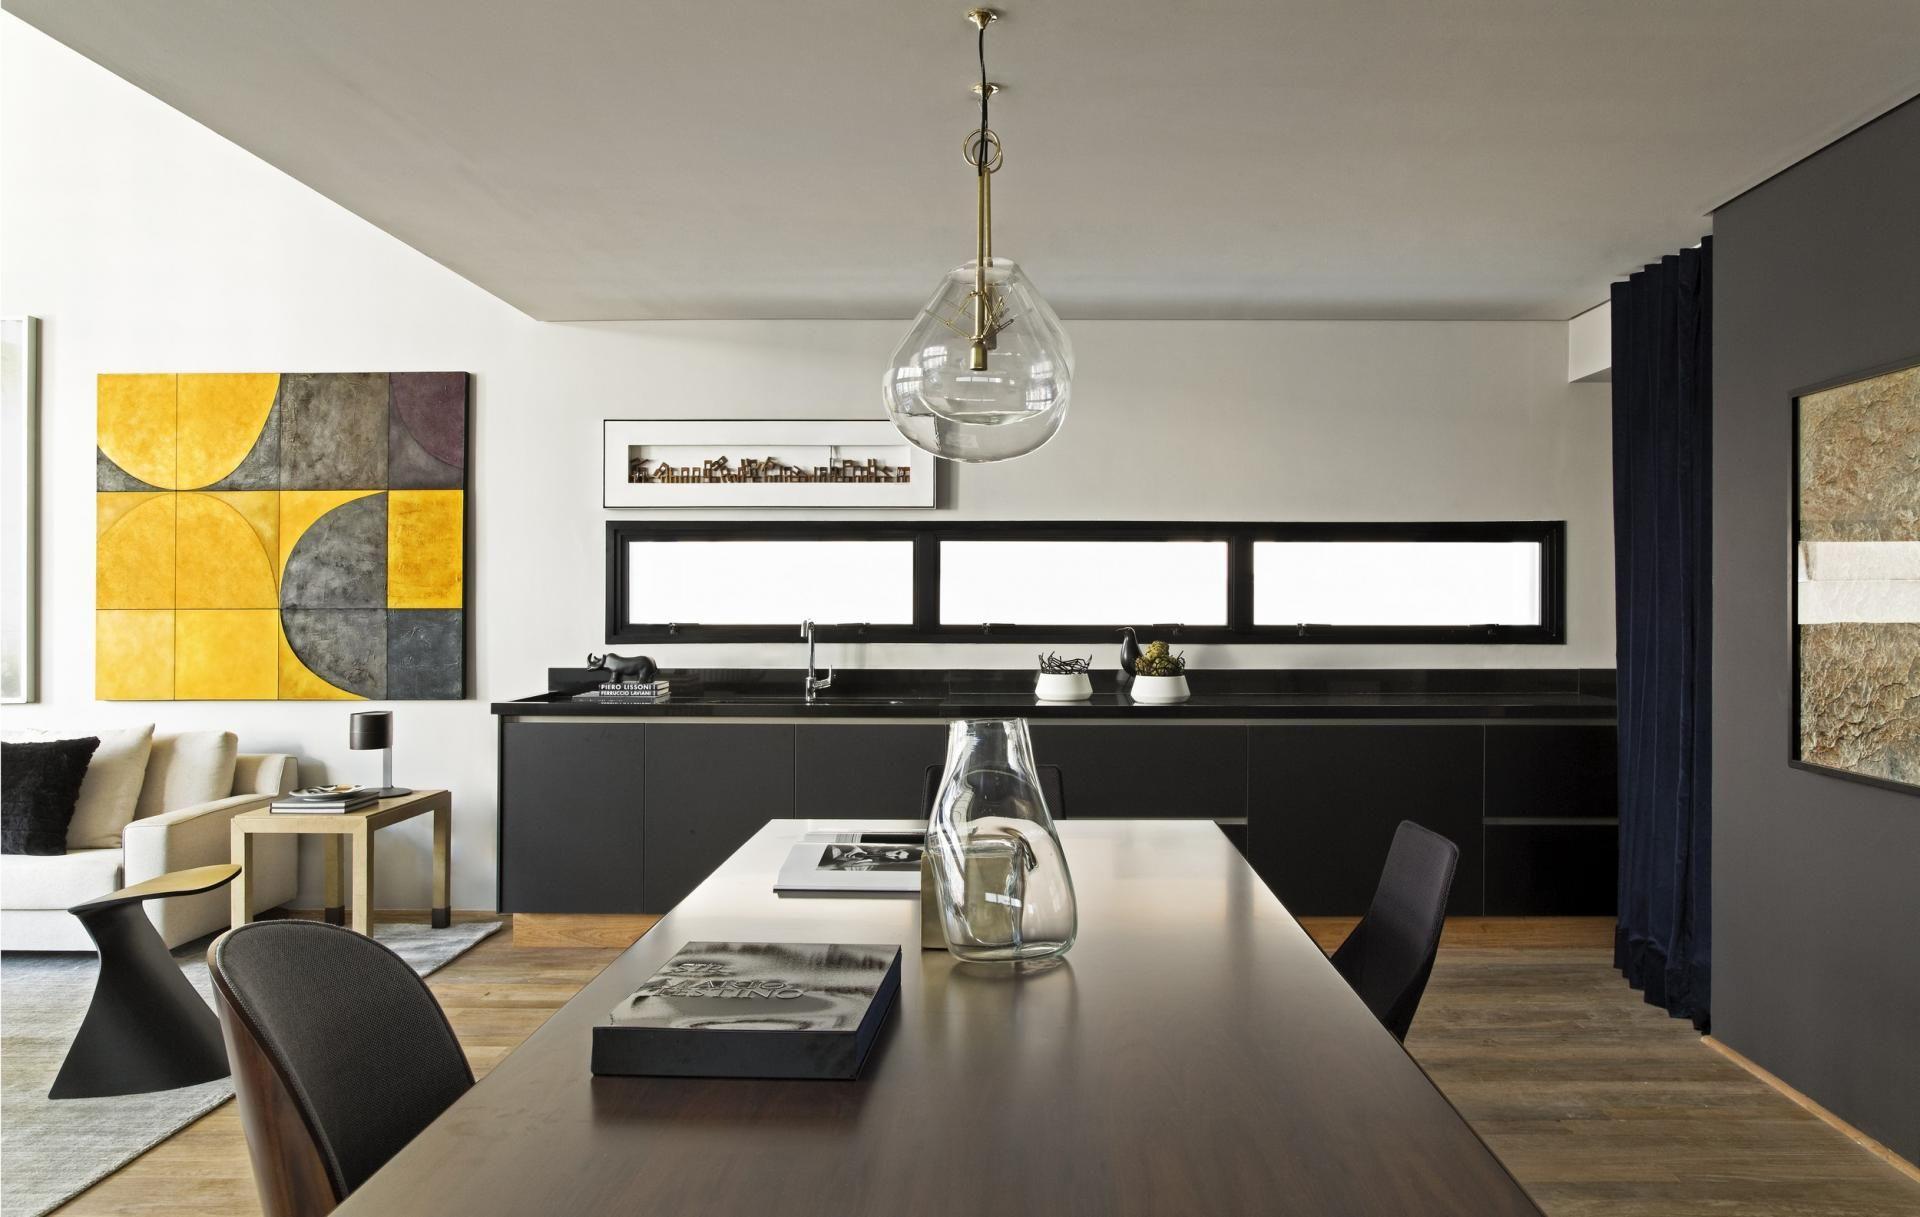 Alain brugier apartment chic modern interior design scandinavian interior design interior designing